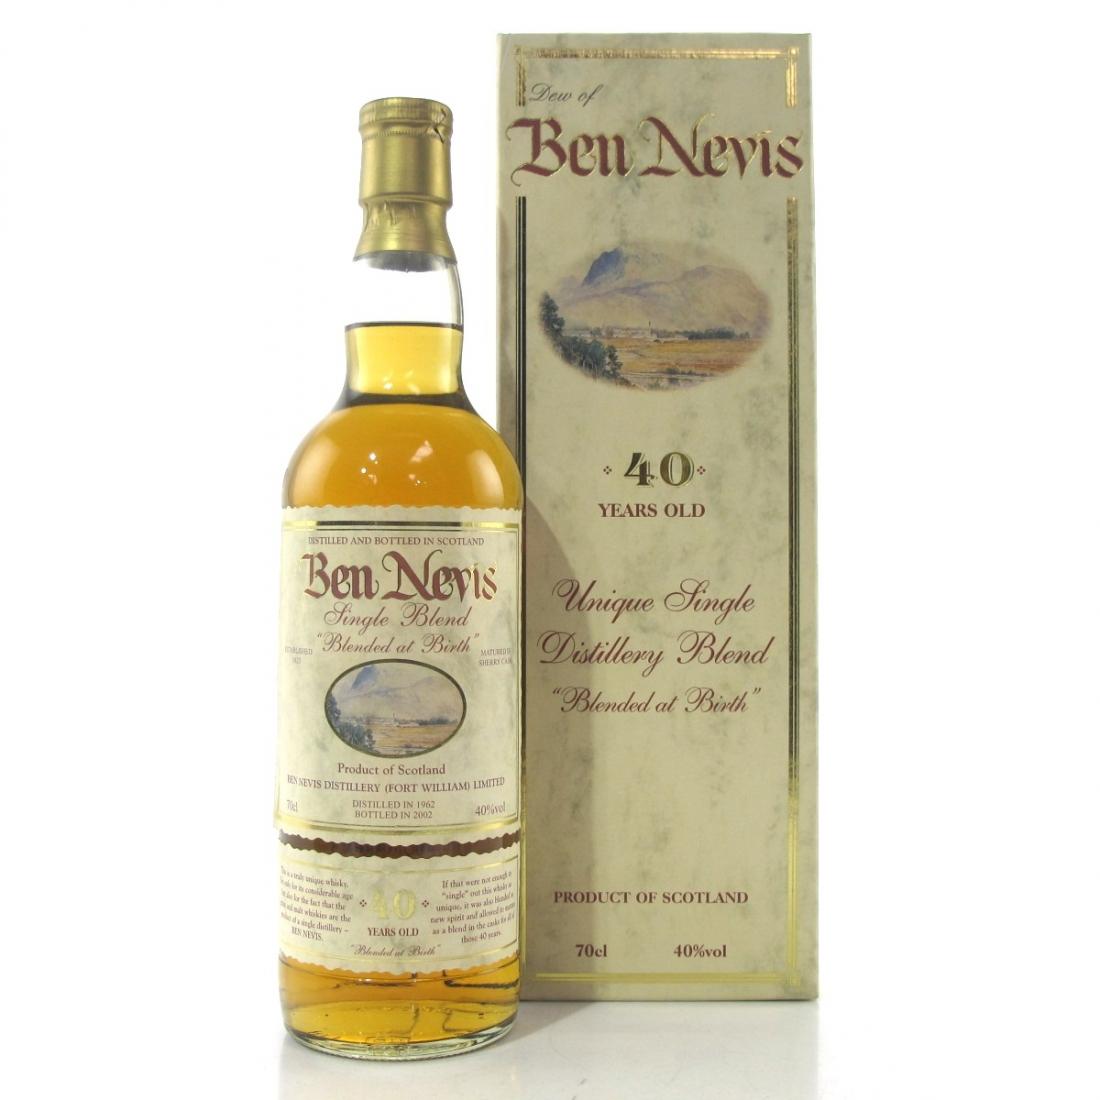 Ben Nevis 1962 Single Blend 40 Year Old